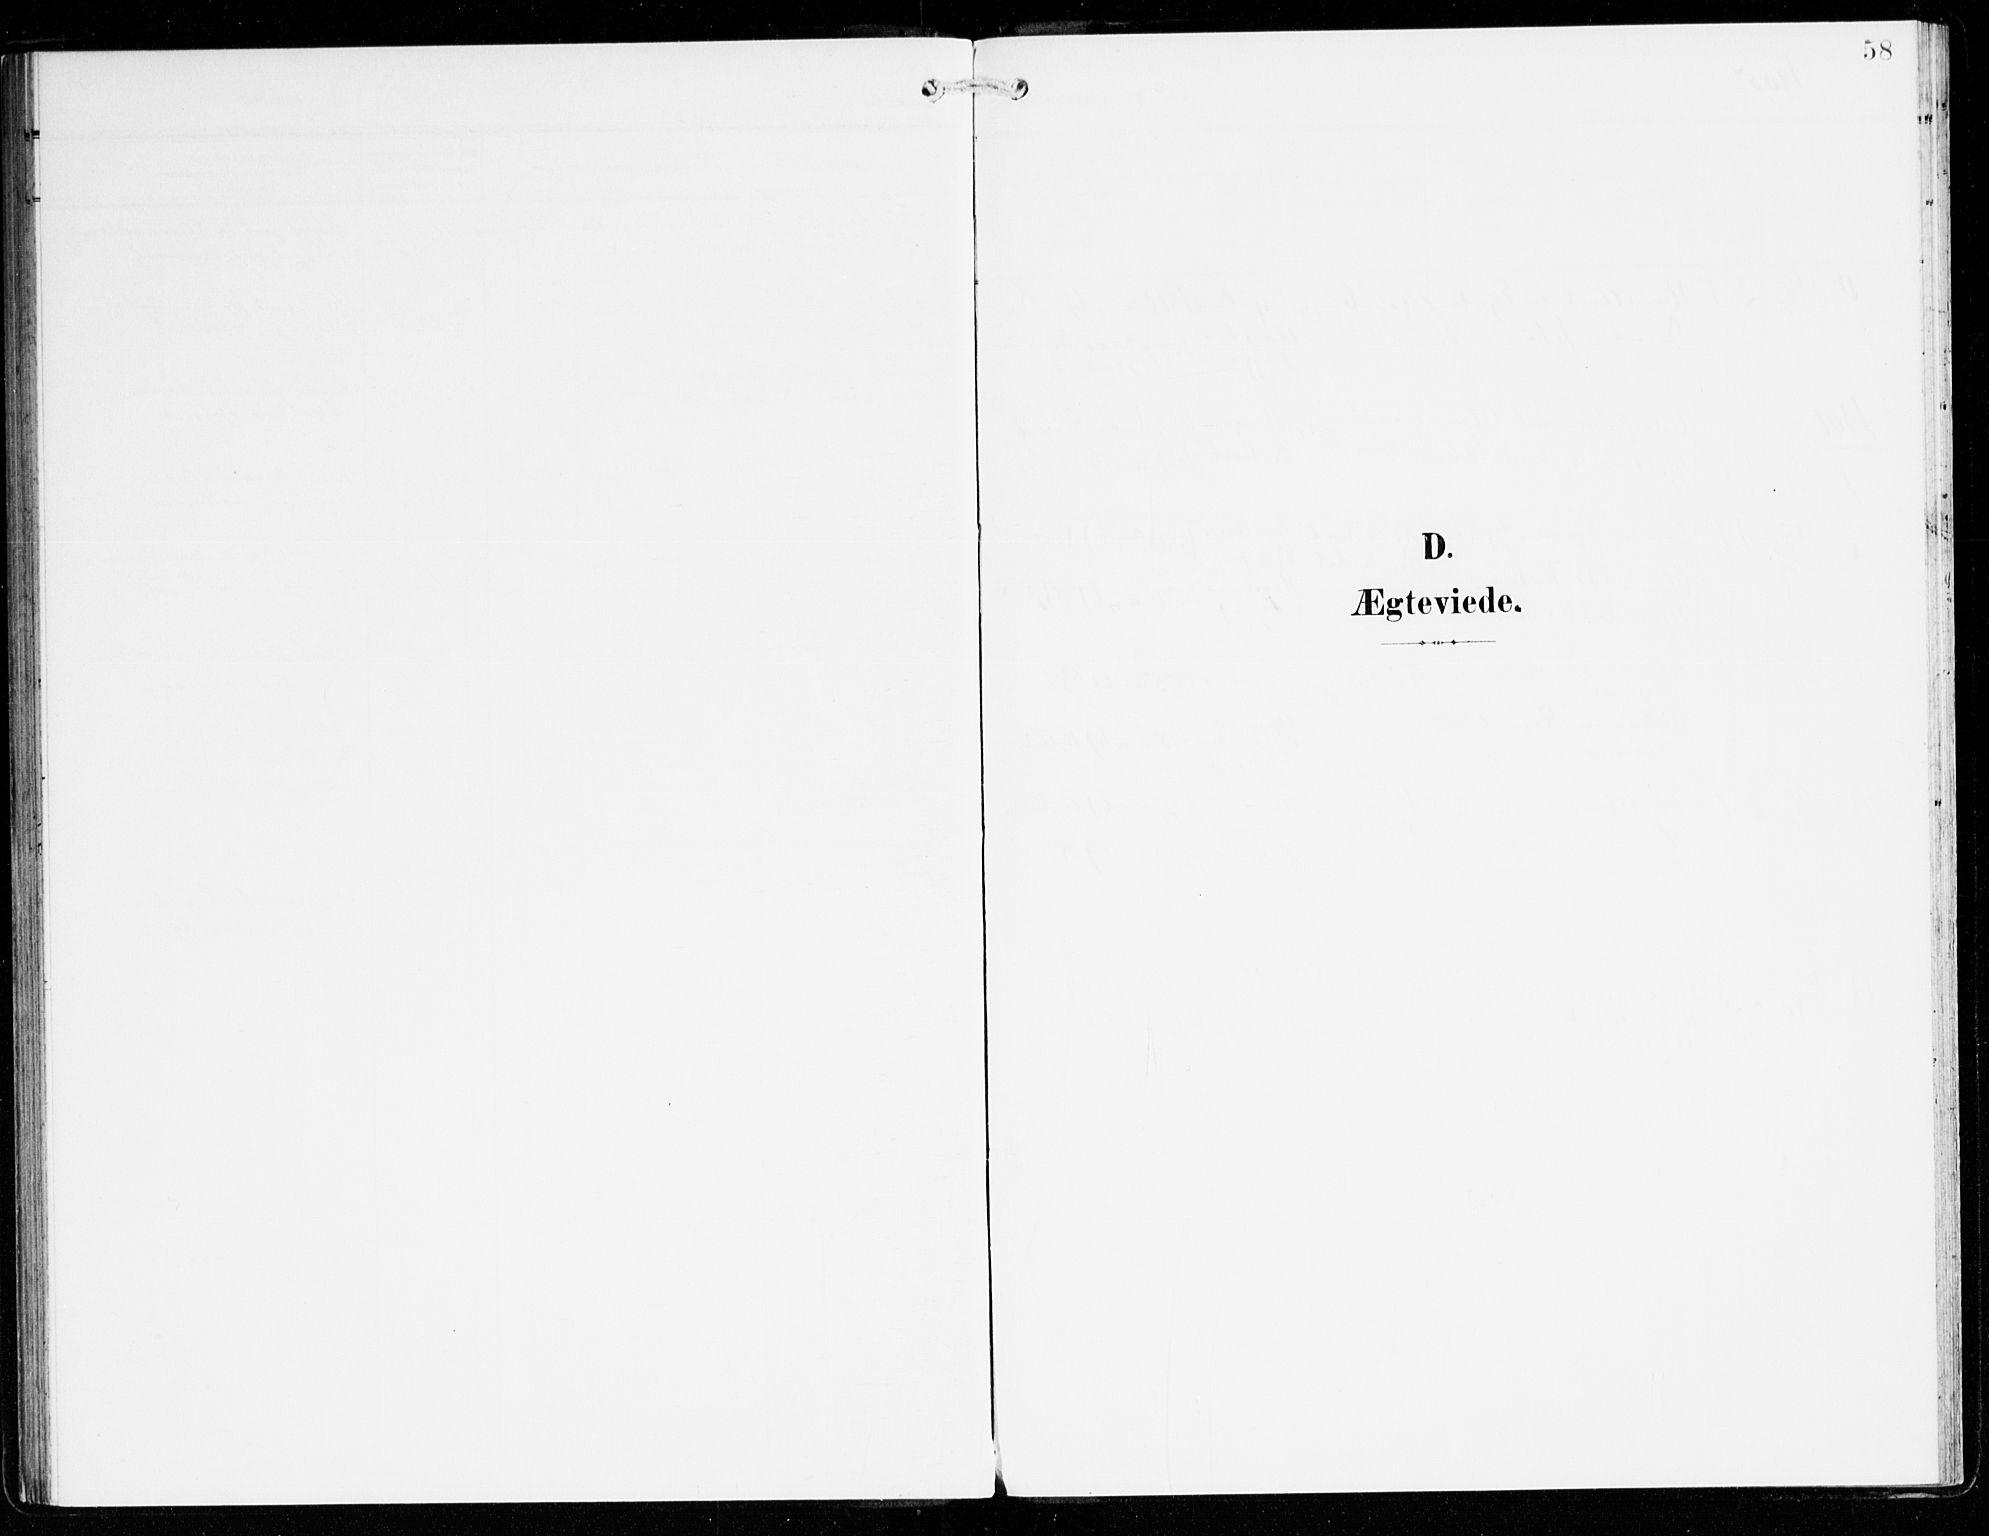 SAB, Hyllestad Sokneprestembete, Ministerialbok nr. C 2, 1904-1917, s. 58